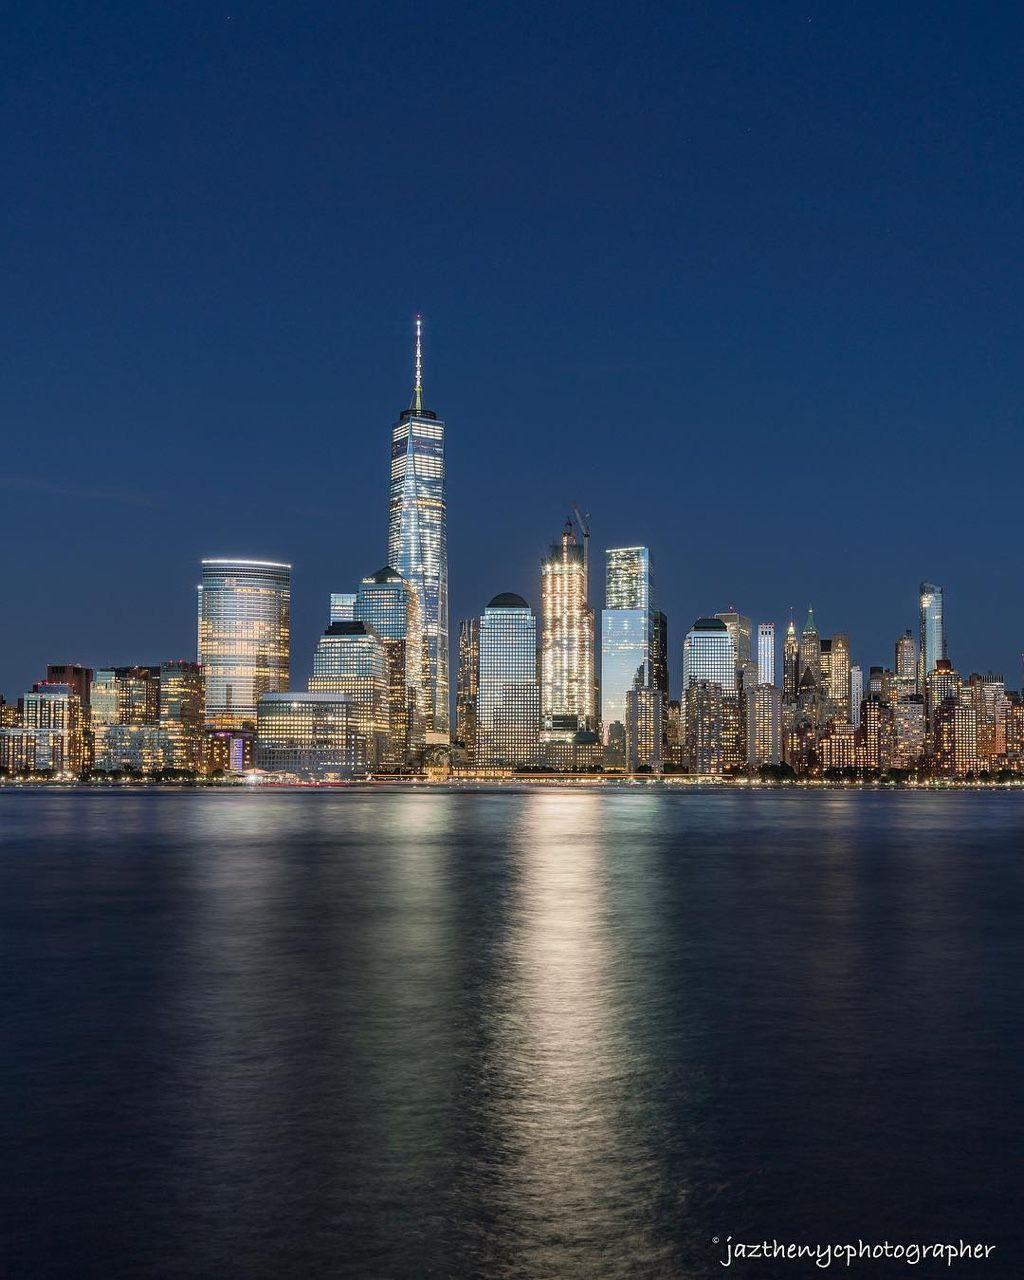 Lower Manhattan by @jazthenycphotographer - New York City Feelings